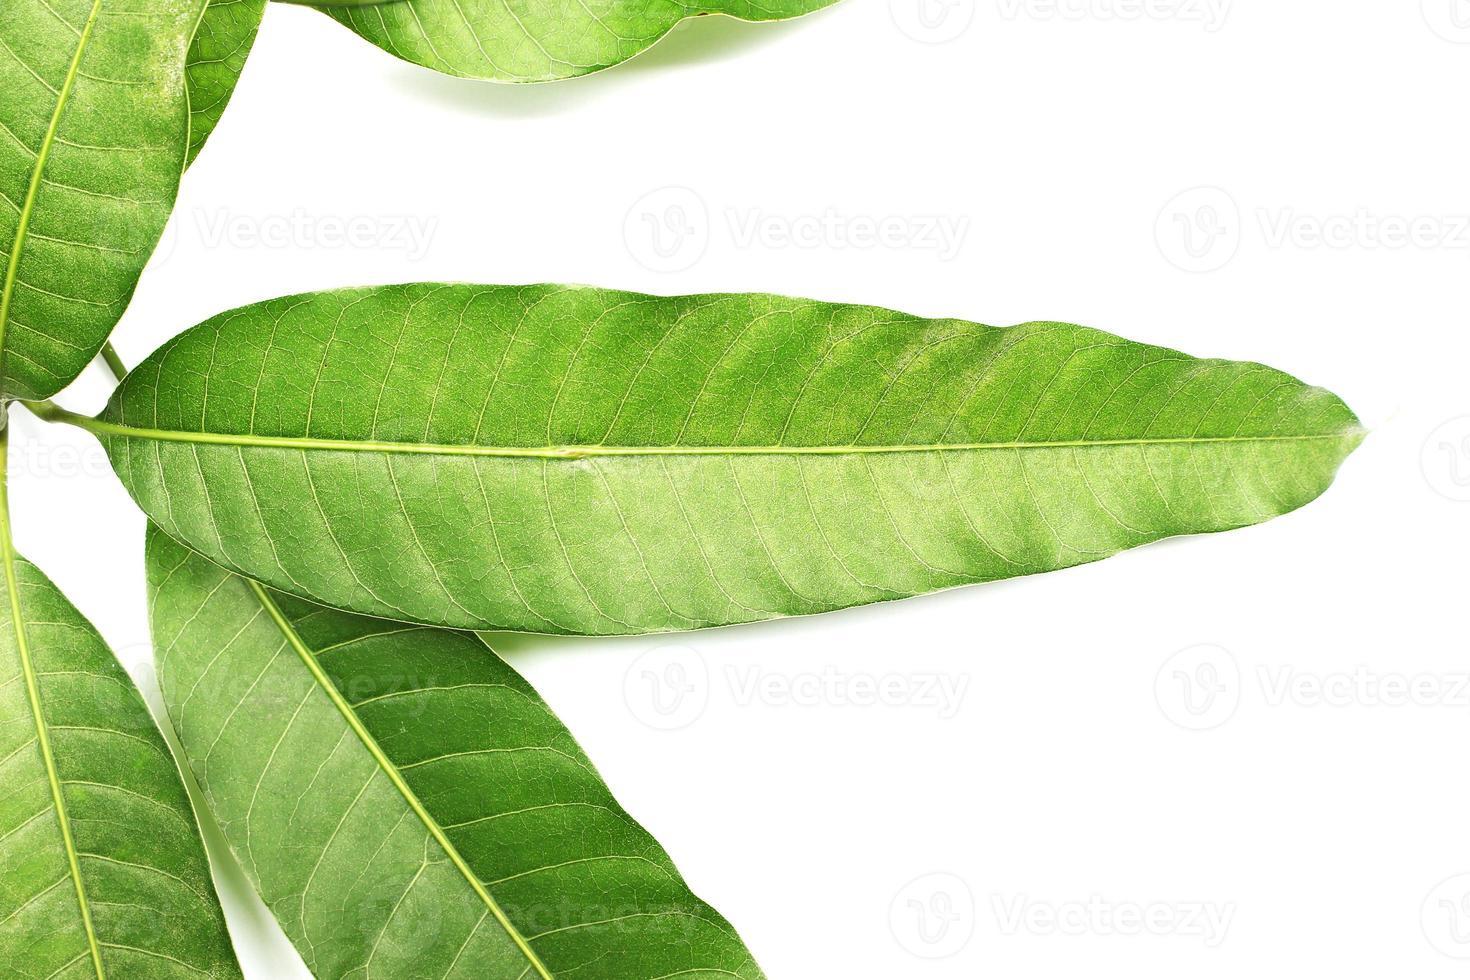 Leaves isolated on white background photo